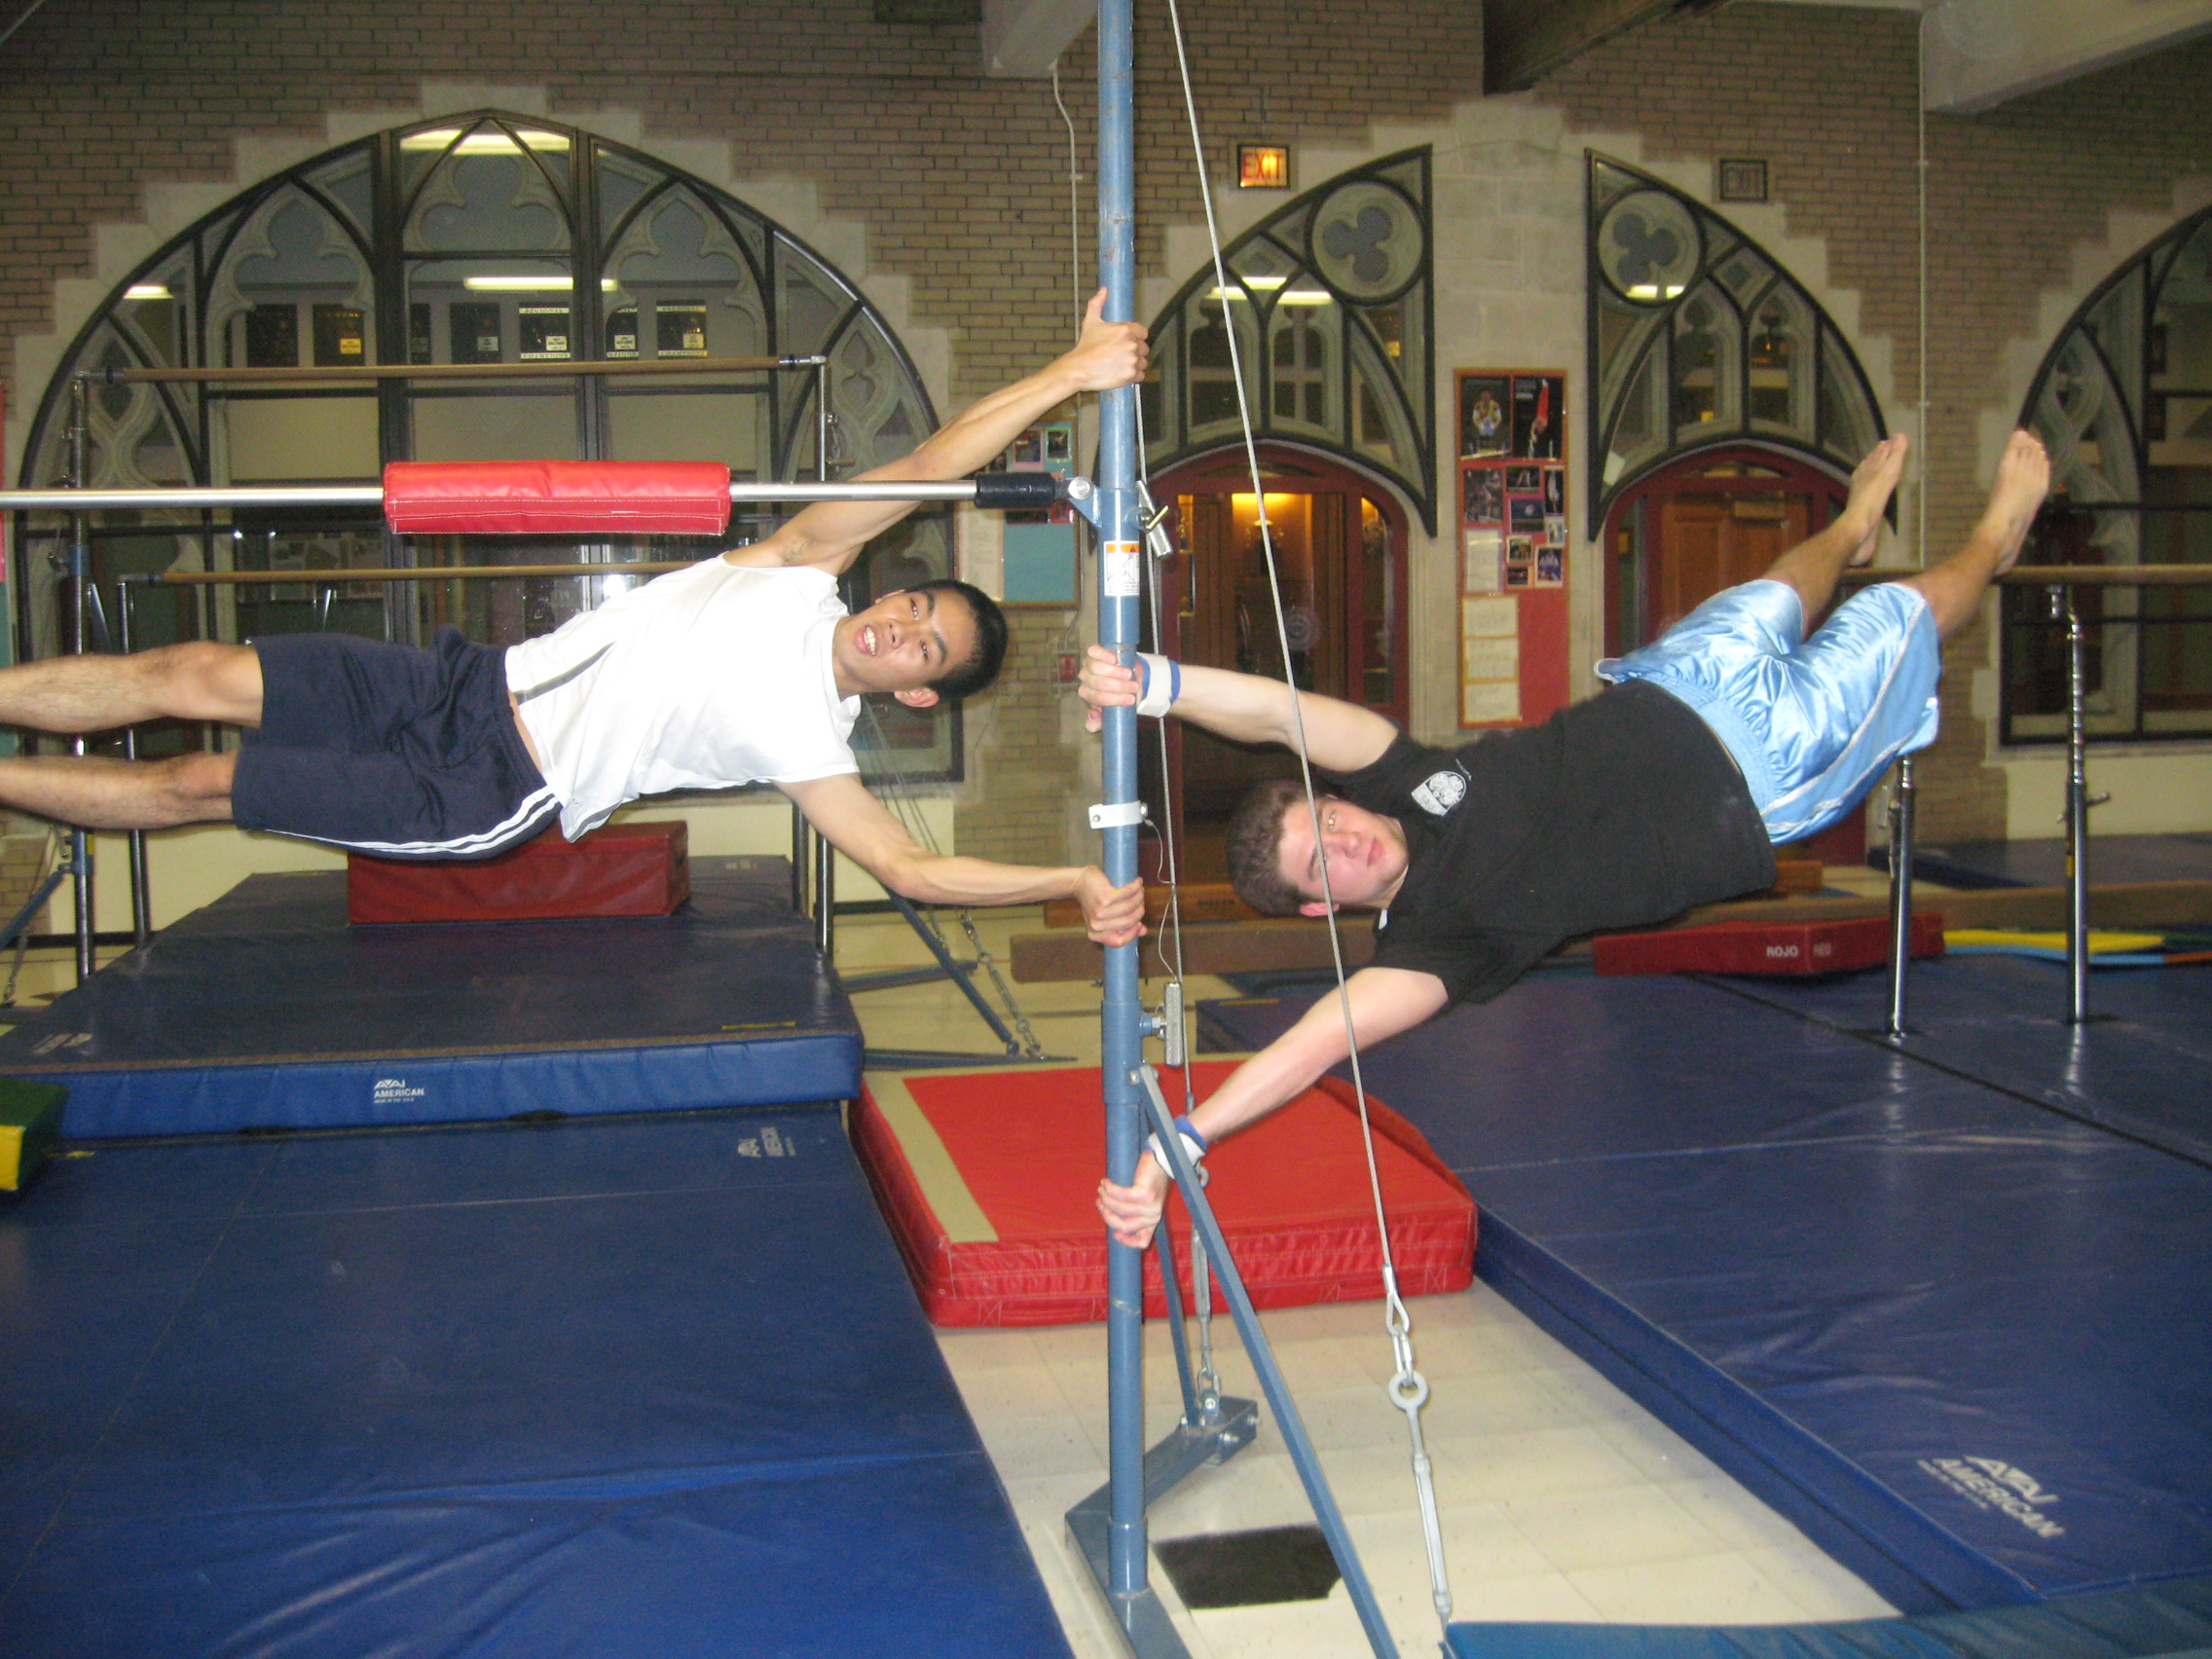 university of chicago gymnastics club